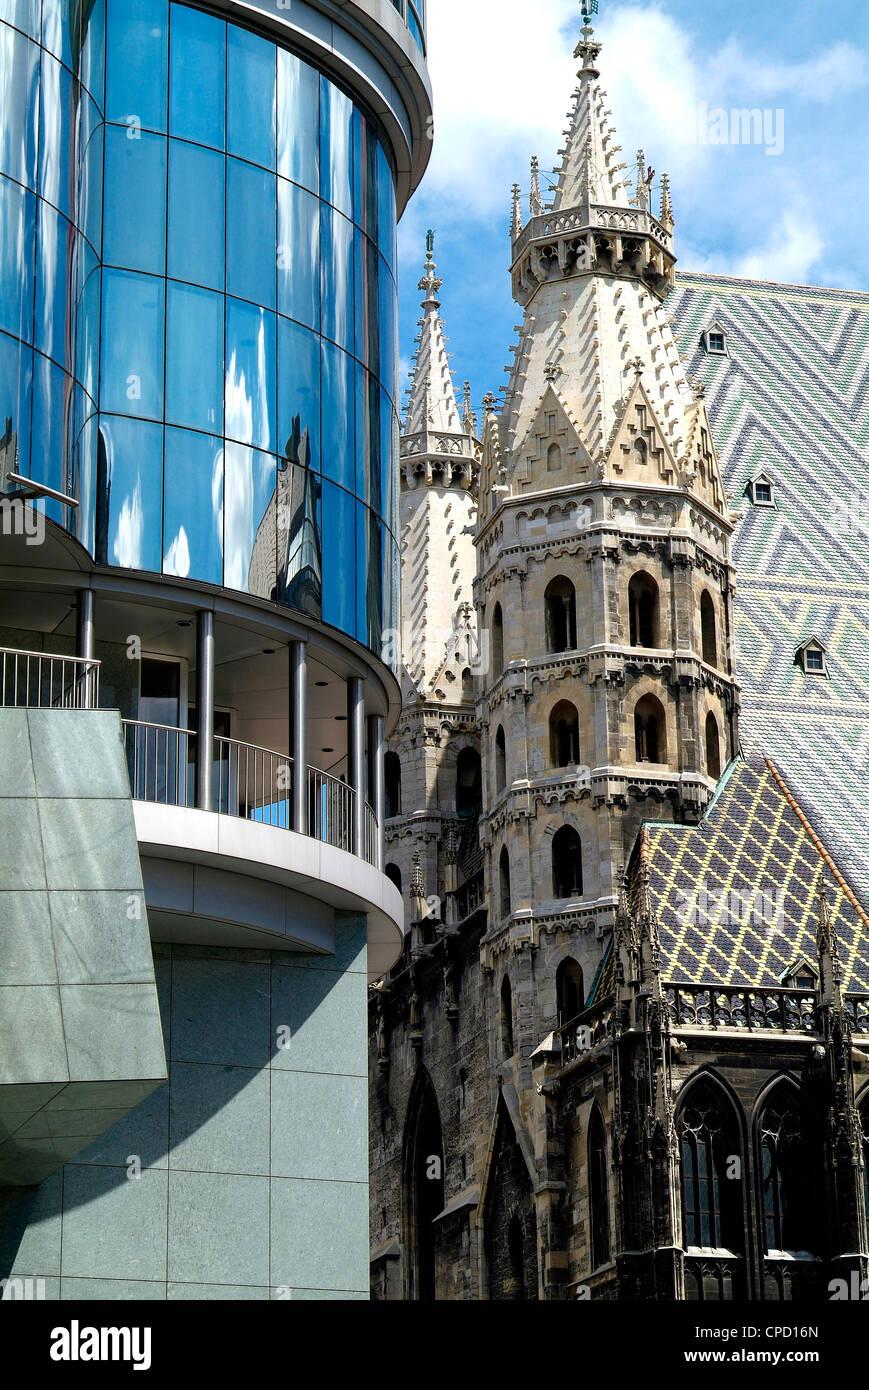 Haas Haus e Stephansdom, Vienna, Austria, Europa Immagini Stock